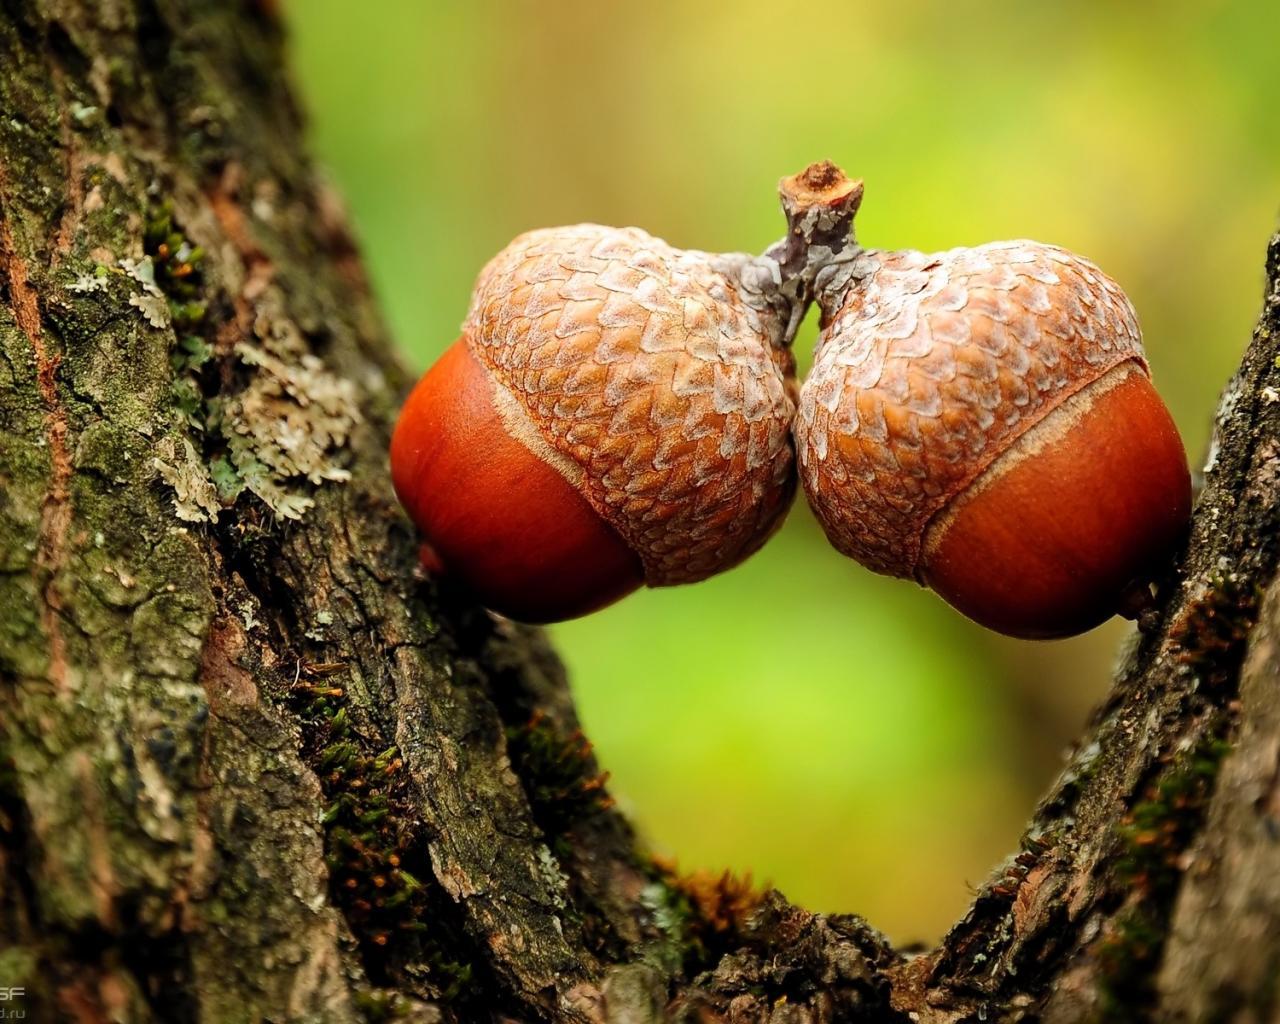 картинки осени листья орехи желуди тучка дождь грибы